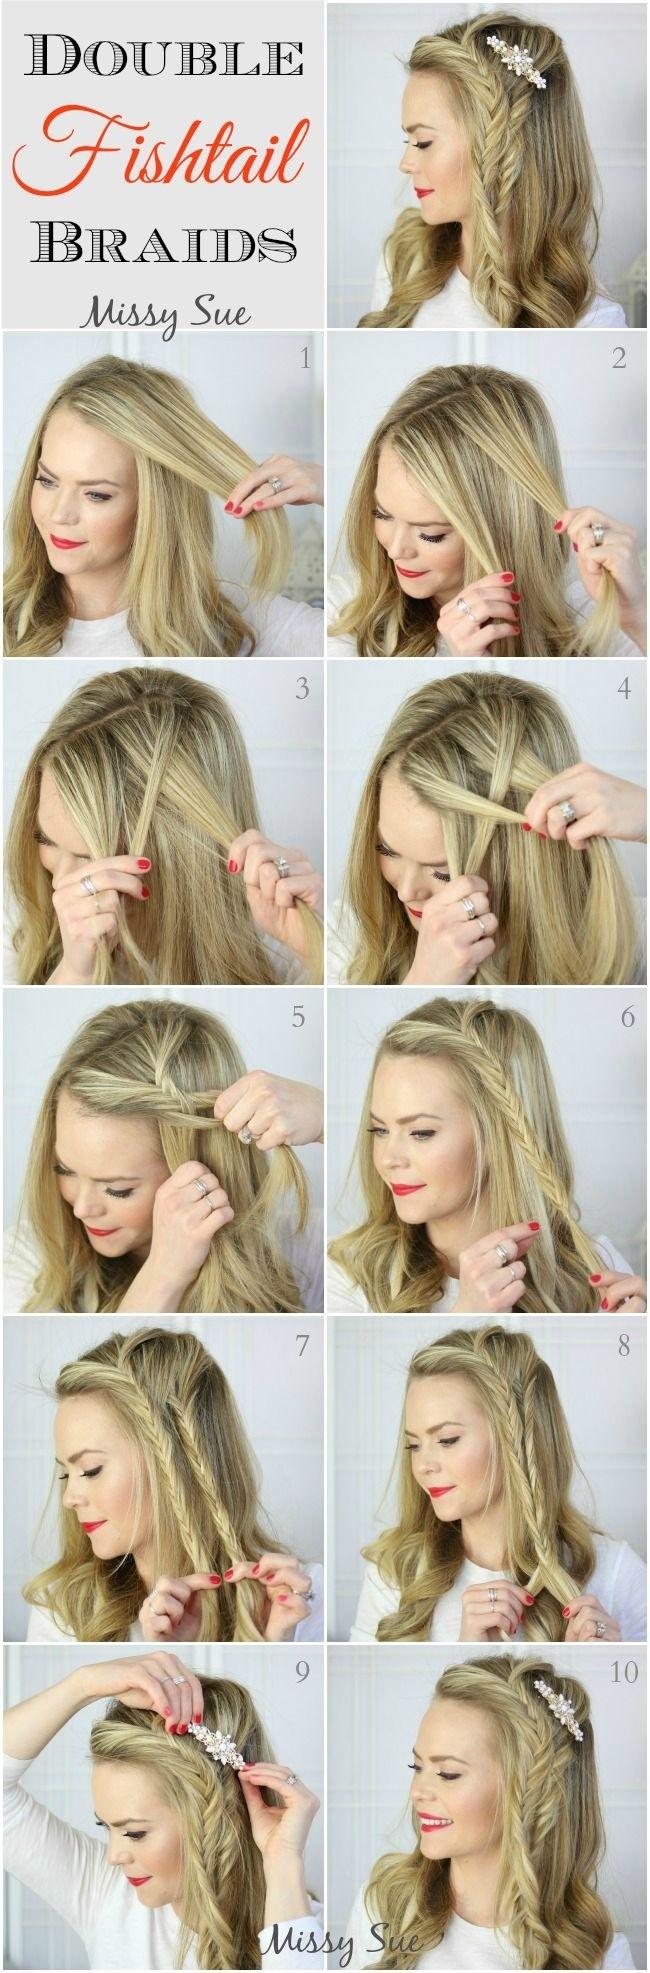 Groovy 10 French Braids Hairstyles Tutorials Everyday Hair Styles Short Hairstyles For Black Women Fulllsitofus